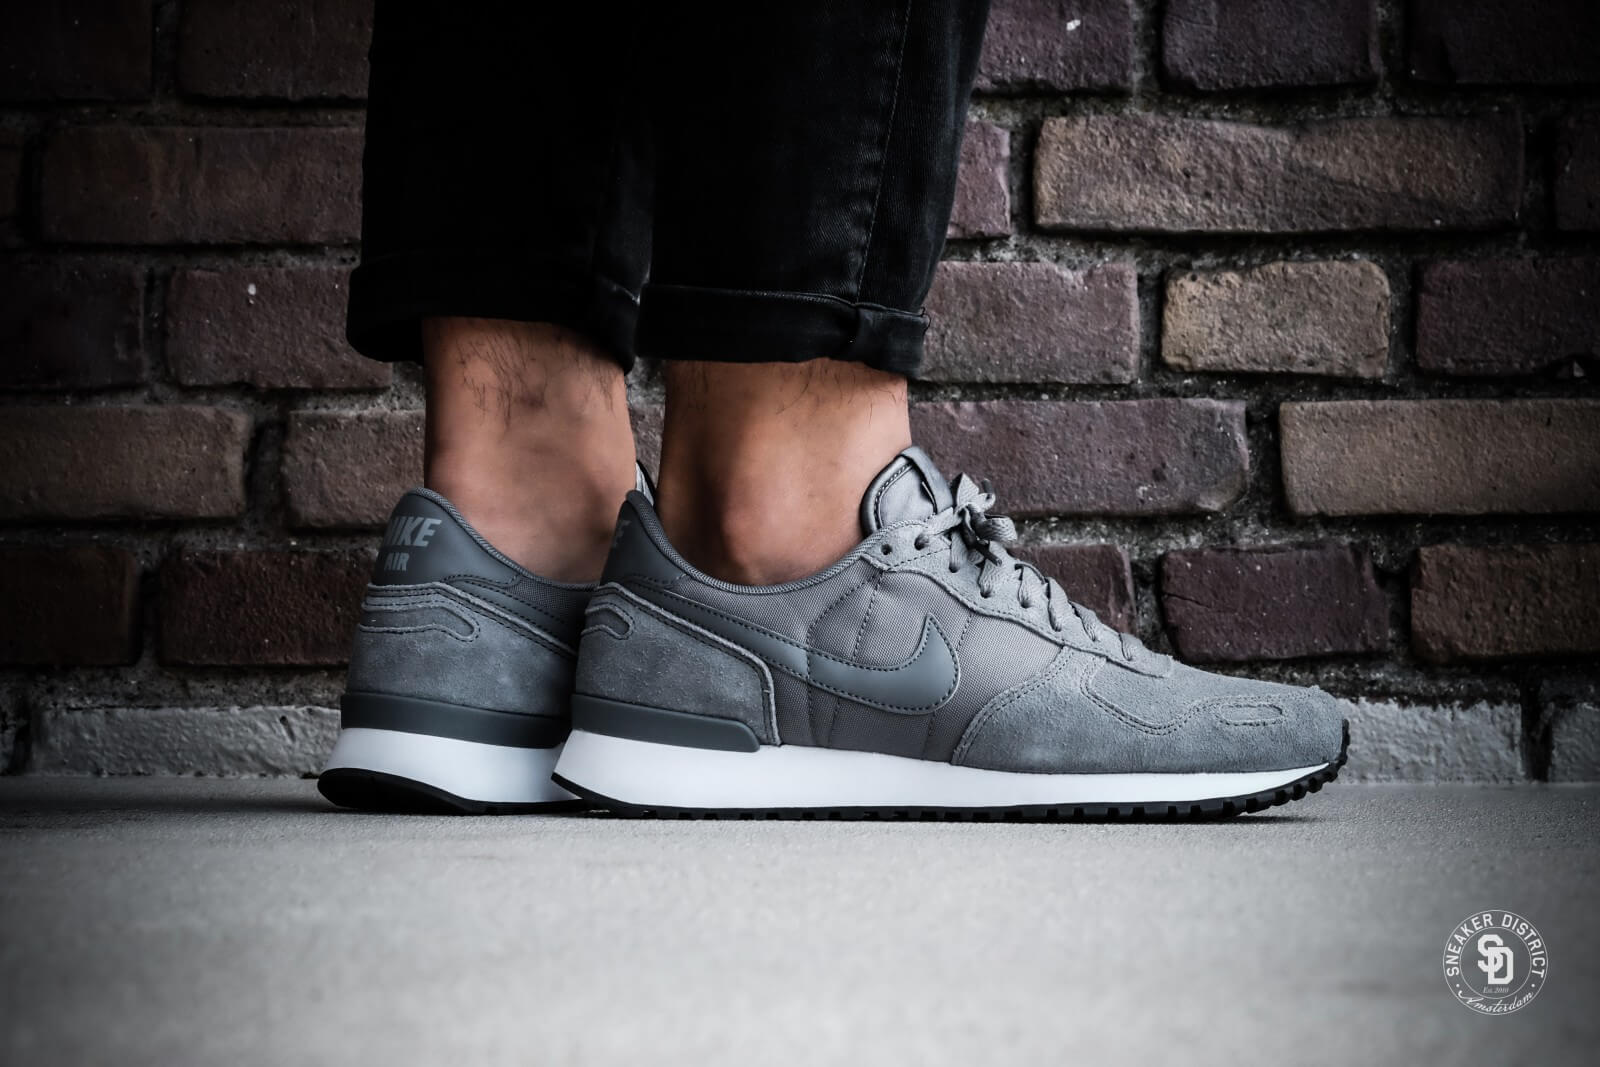 Estribillo invadir Festival  Nike Air Vortex Leather Cool Grey/White-Black - 918206-002